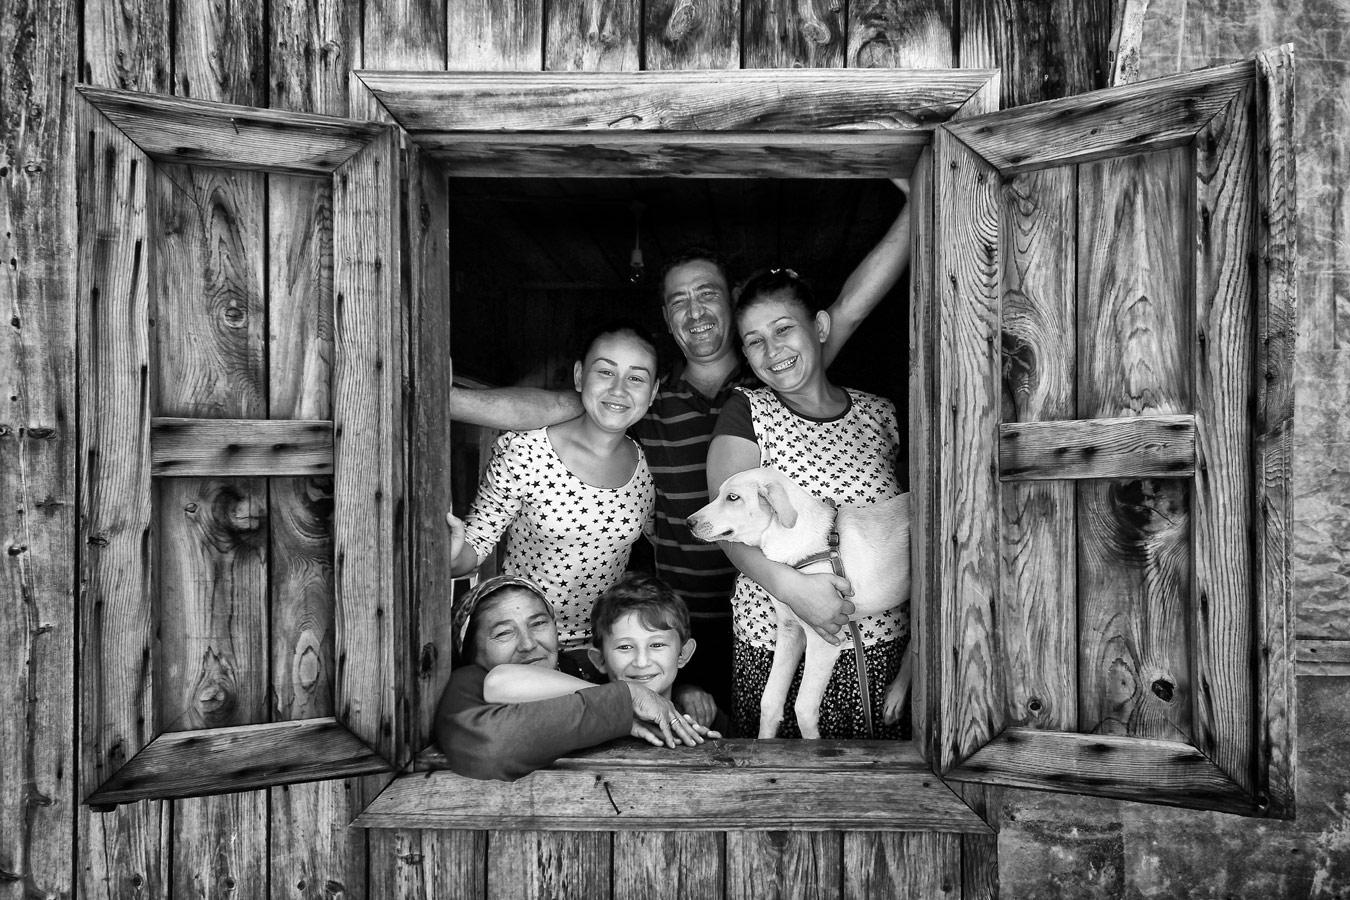 Family, © Leyla Emektar, Turkey, 1st Place, World Wood Day Photo Contest